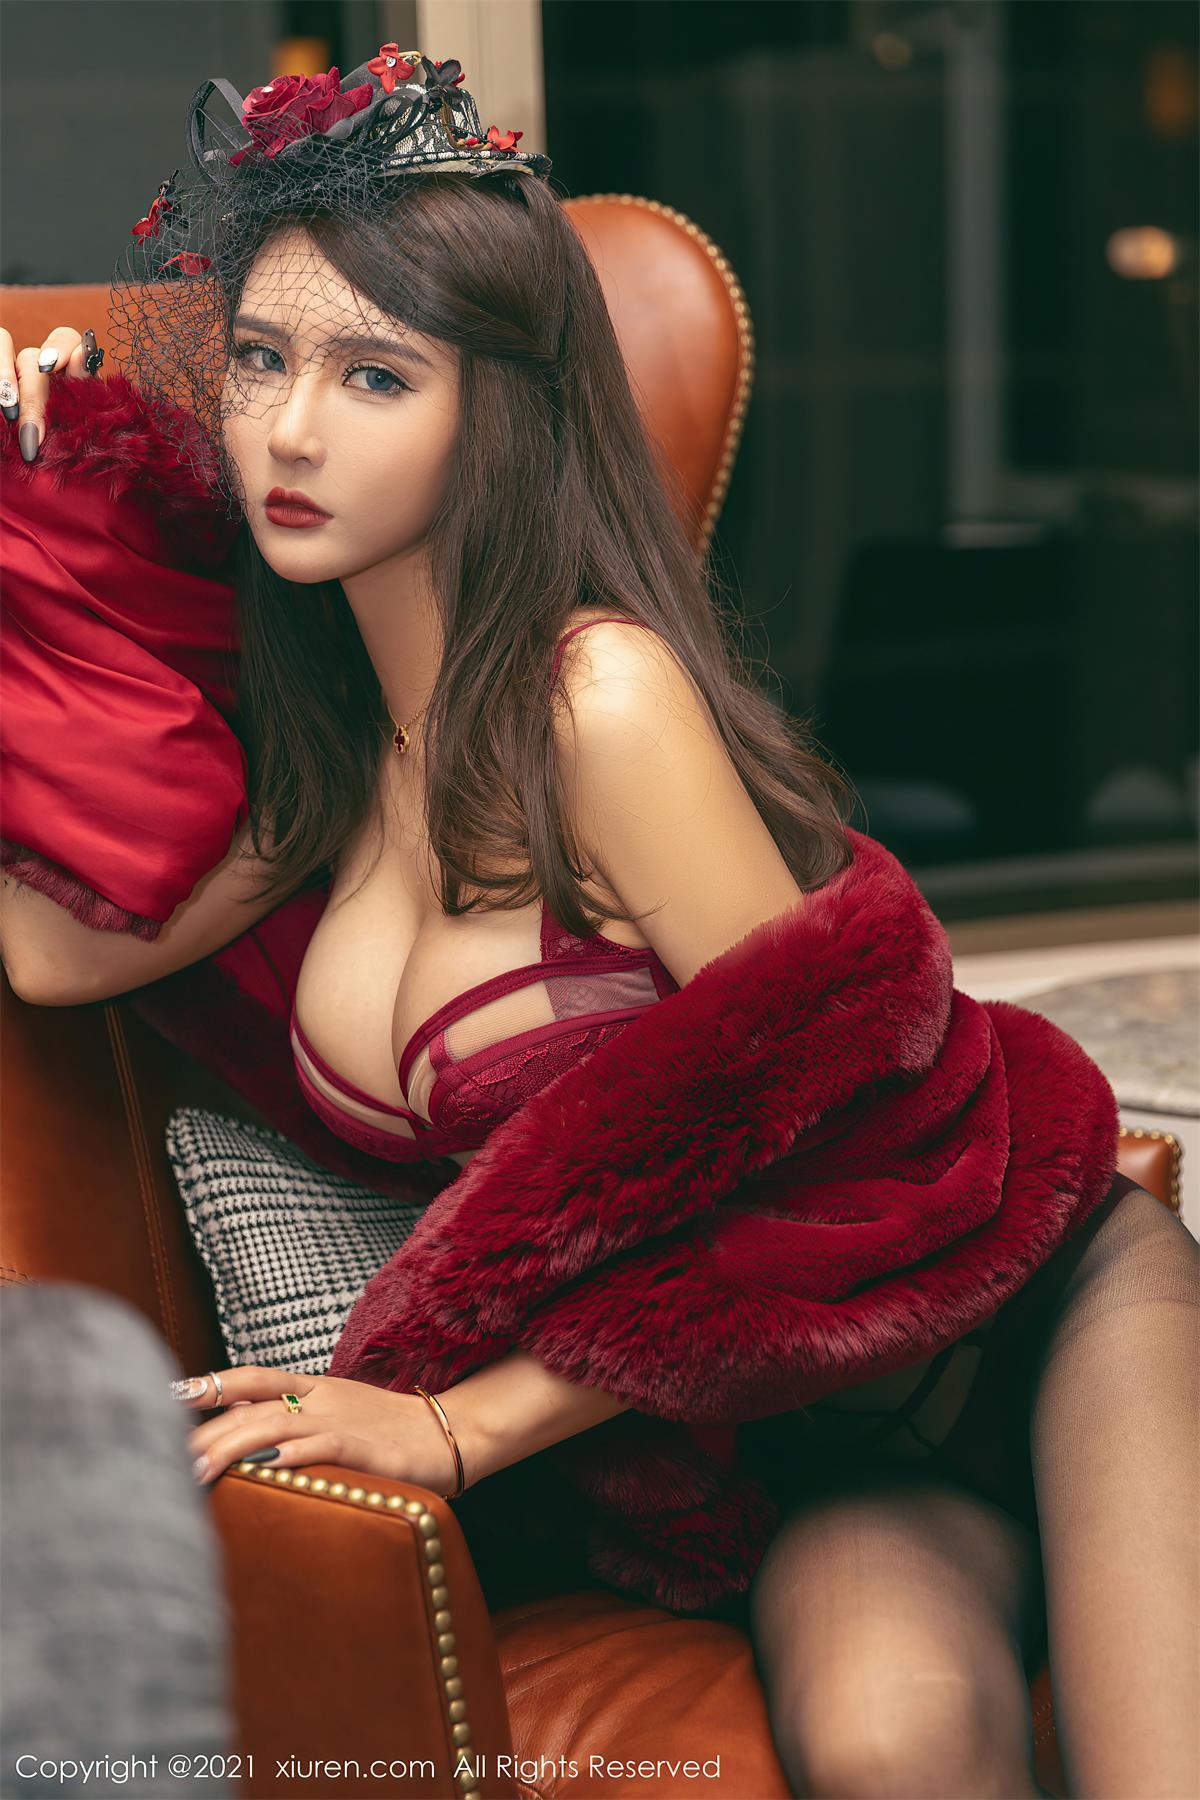 XIUREN秀人网 – 性感女郎写真套图合集下载(VOL.3501-3600期)